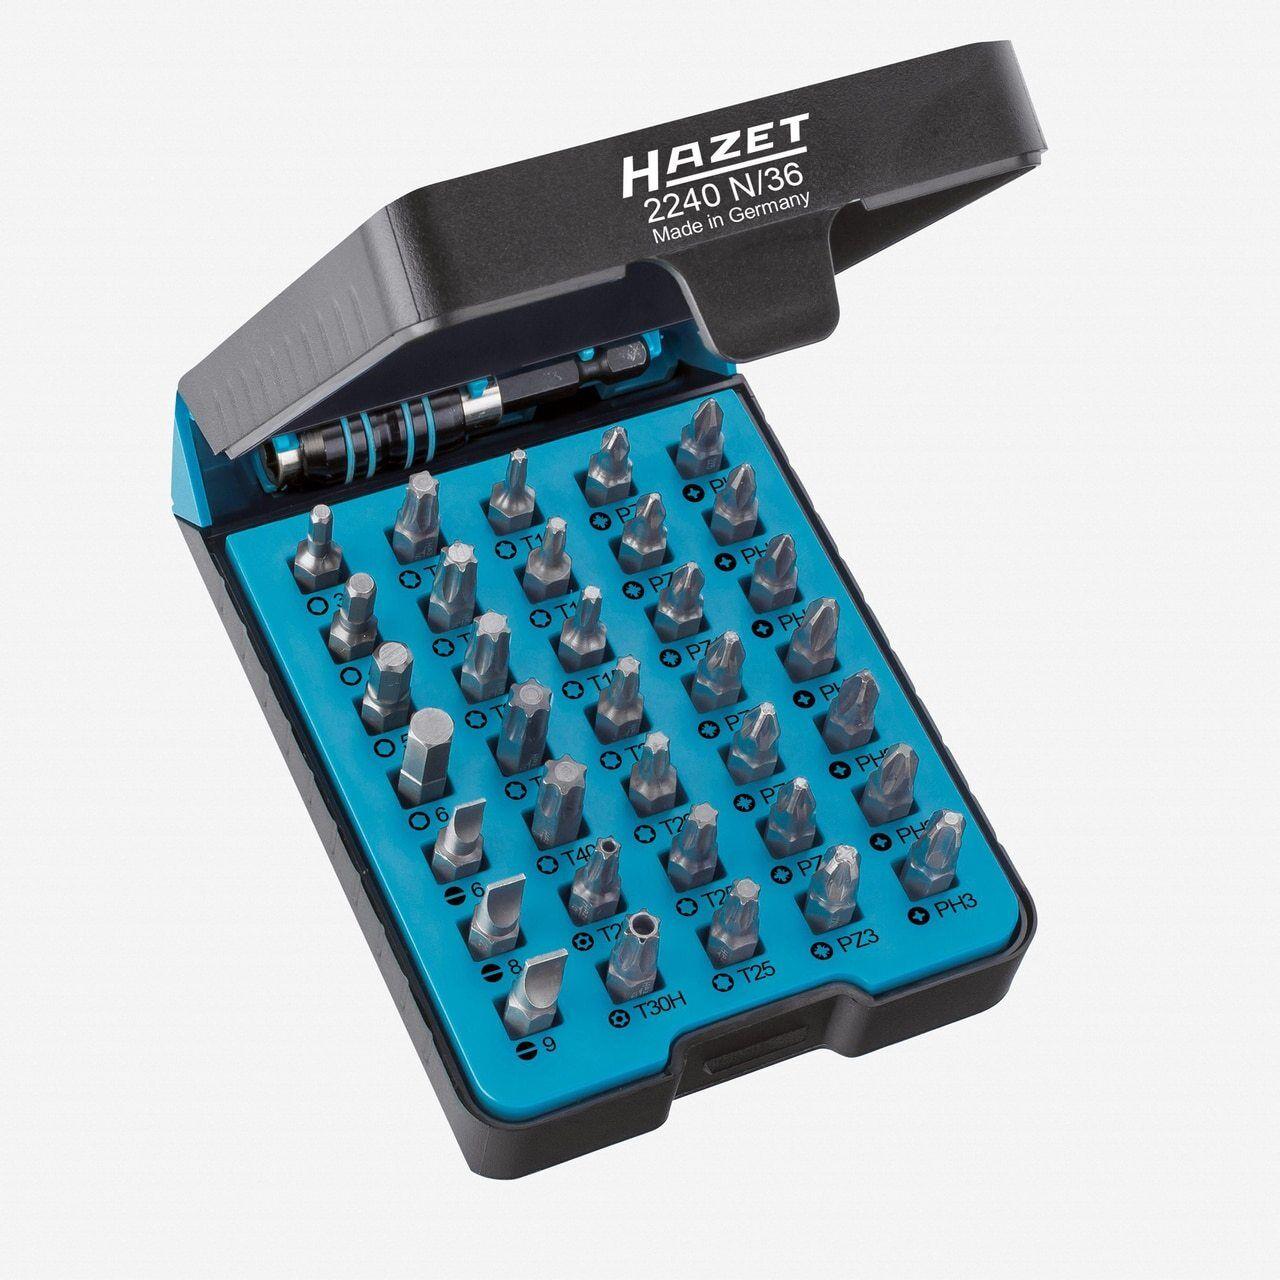 Hazet 2240N 36  BitE -box - screwdriver bit set